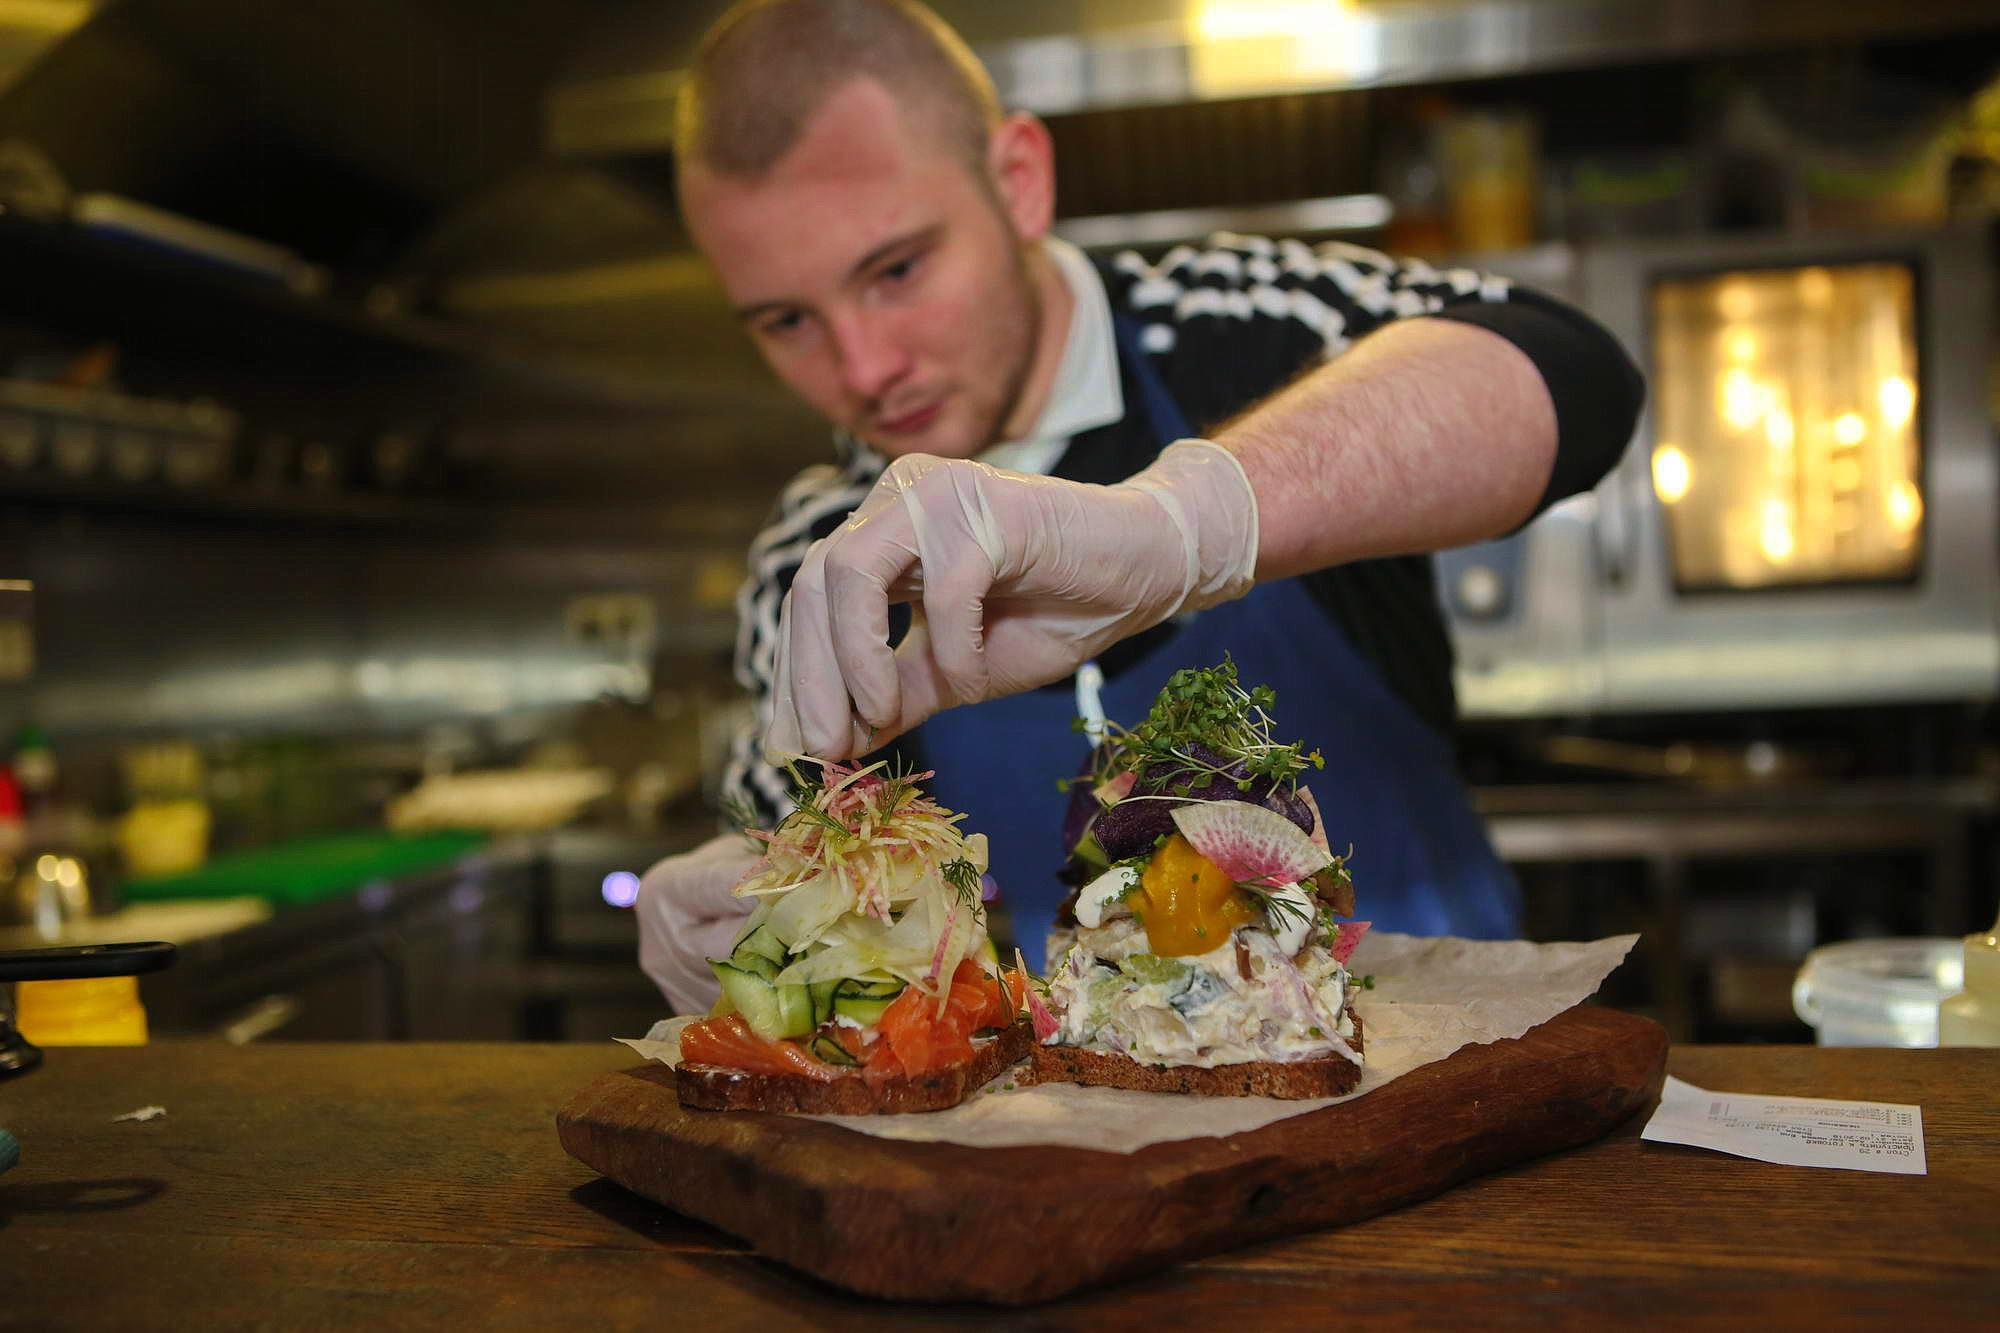 Where to get Danish smørrebrød open sandwiches in Kyiv | KyivPost